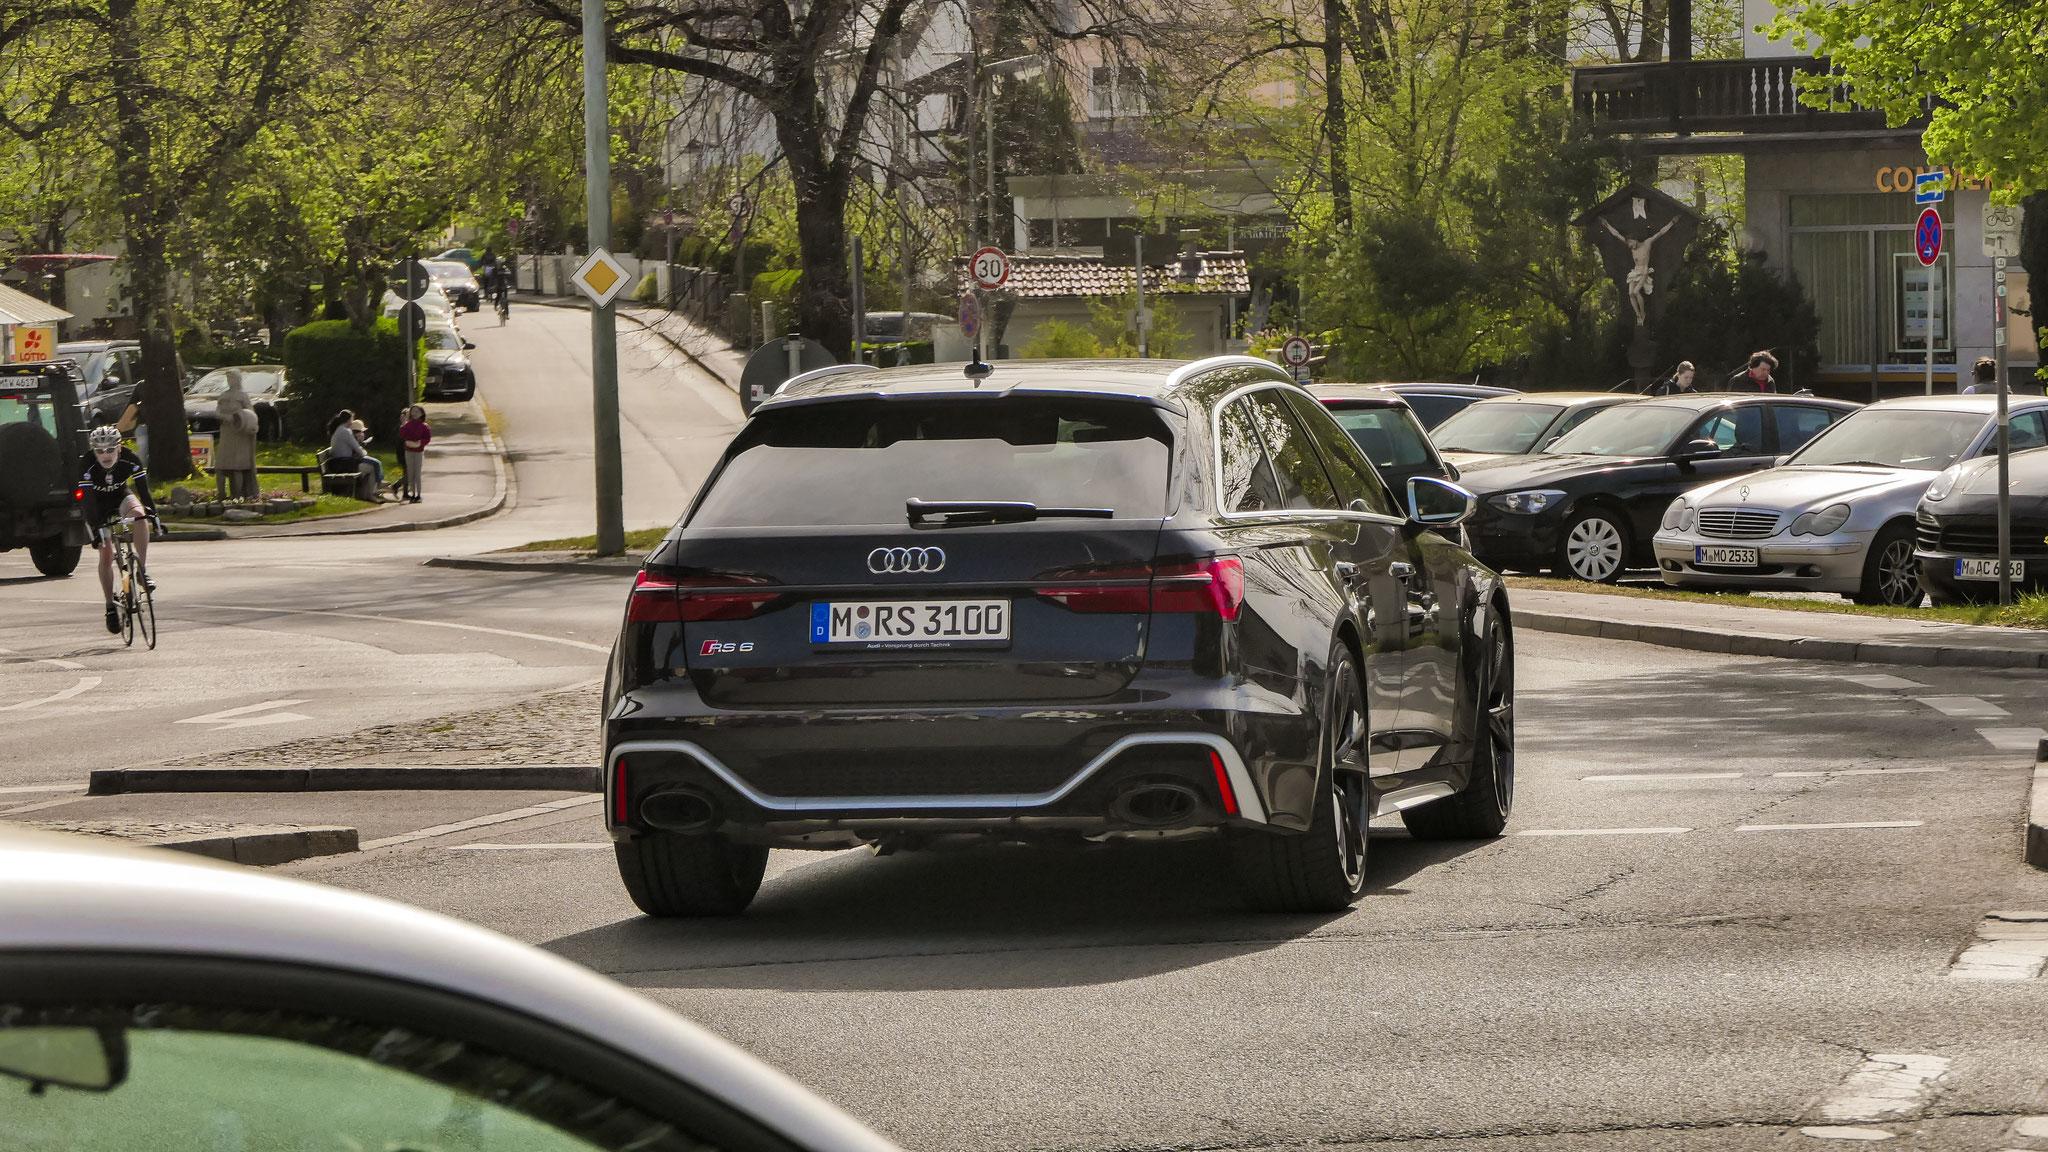 Audi RS6 - M-RS-3100